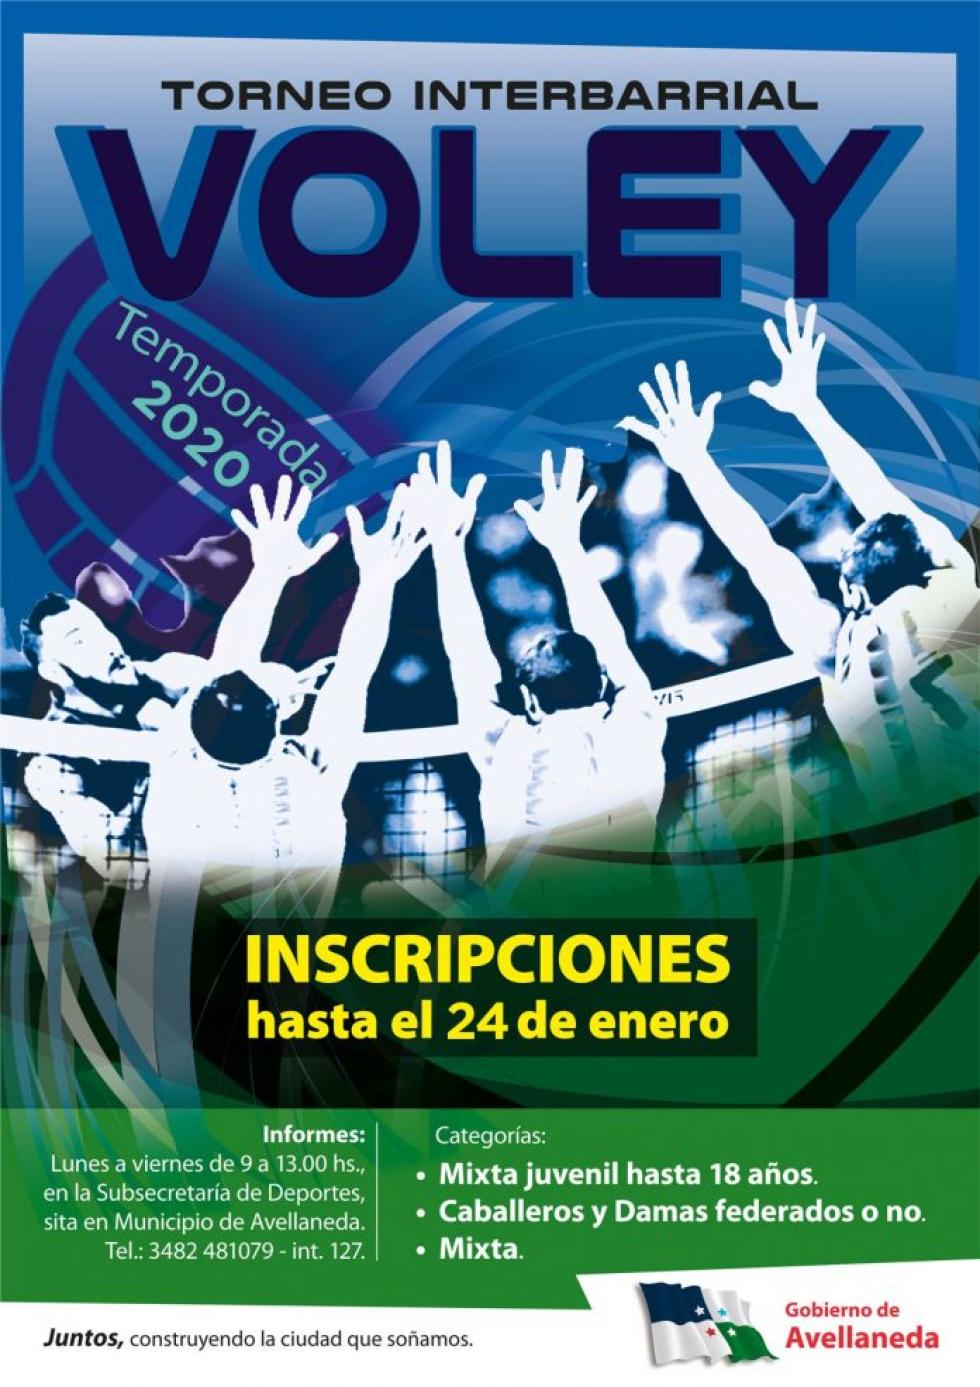 voley-interbarrial-2020-696x985.jpg